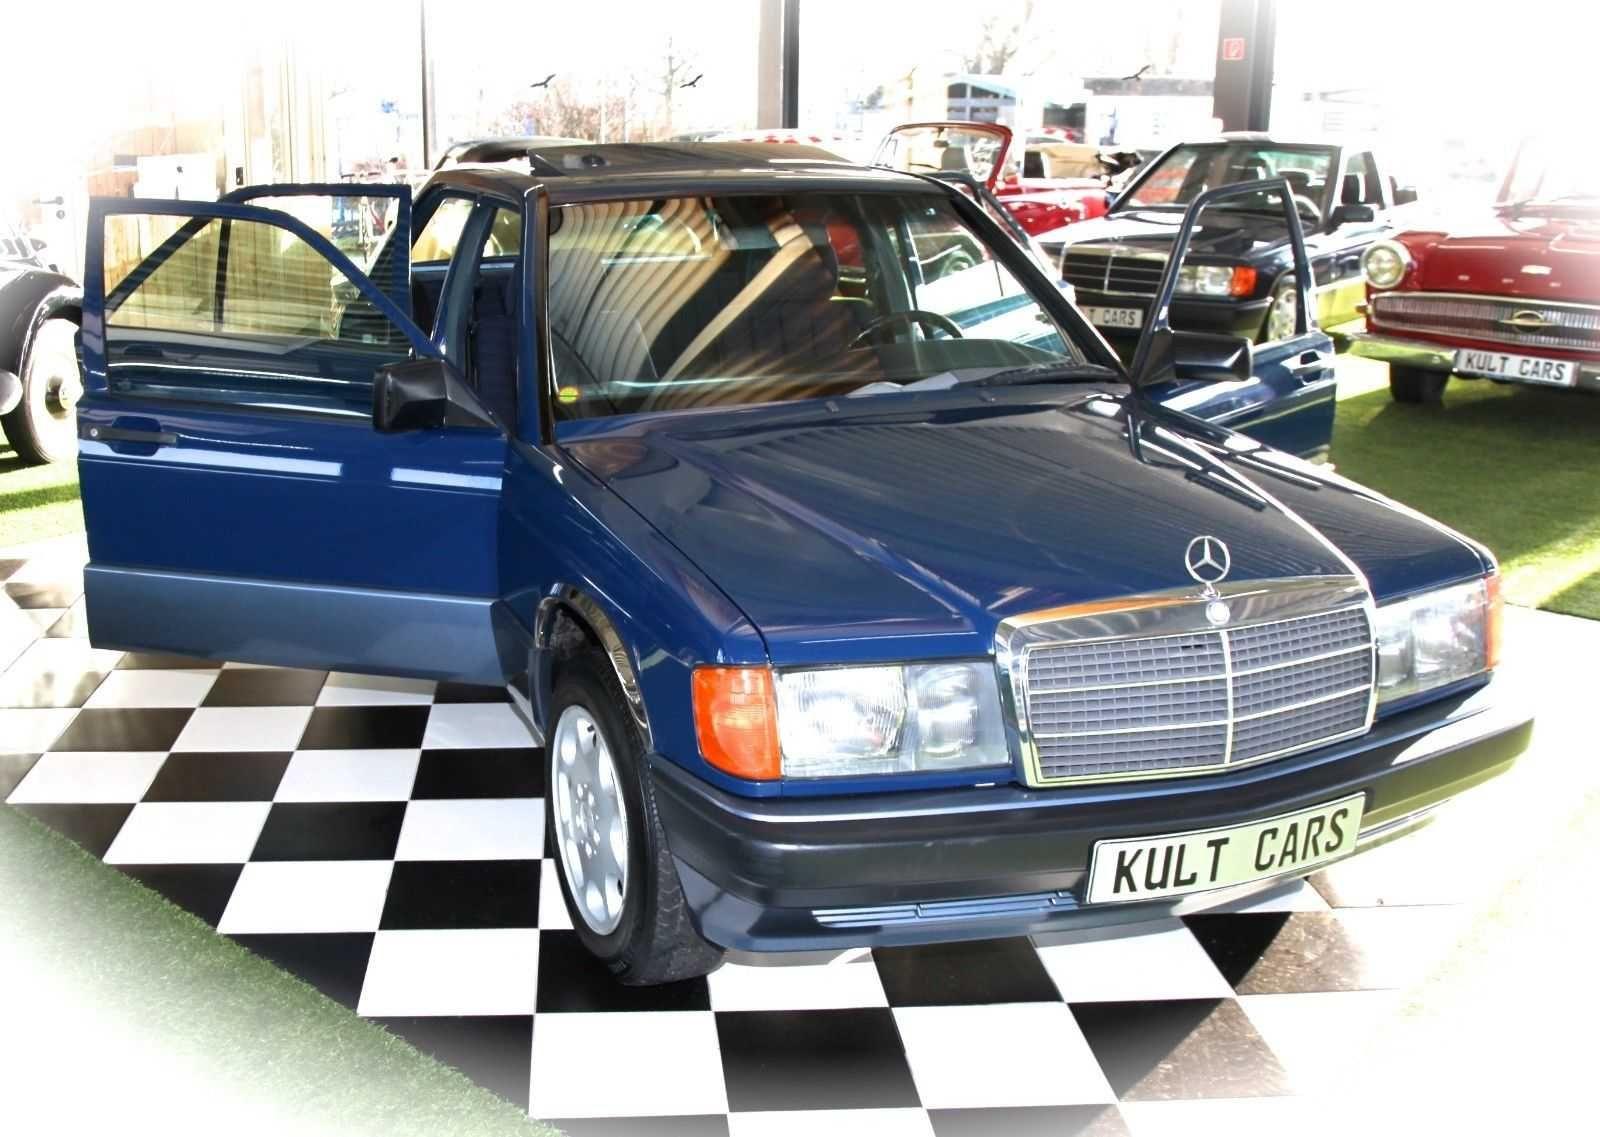 Mercedes Benz 190 Diesel W201 Youngtimer aus1989 190d fast Oldtimer   Check more at https://0nlineshop.de/mercedes-benz-190-diesel-w201-youngtimer-aus1989-190d-fast-oldtimer/